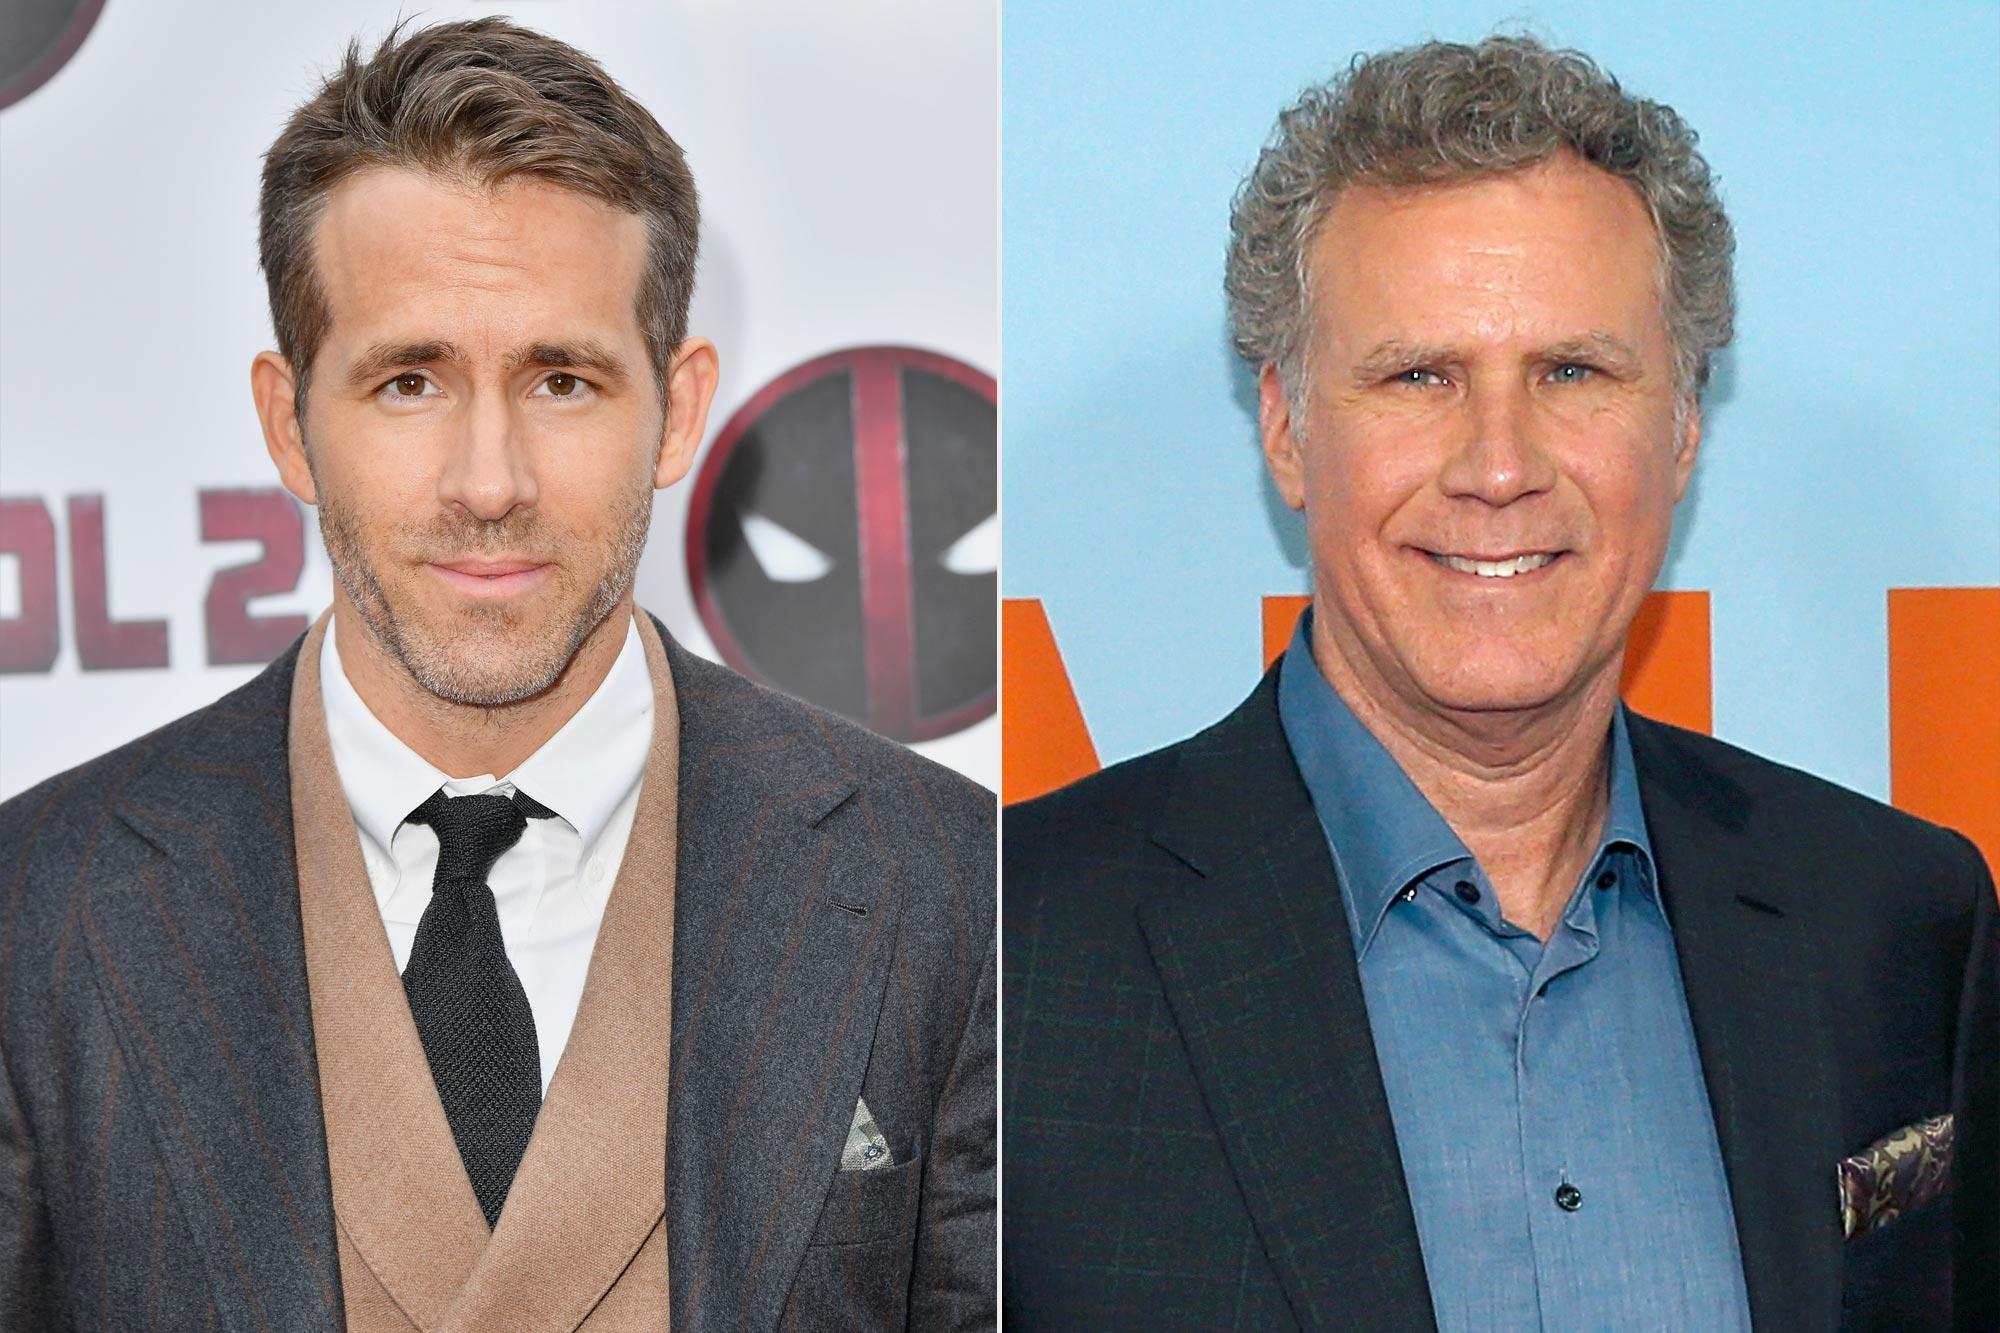 Ryan Reynolds and Will Ferrell